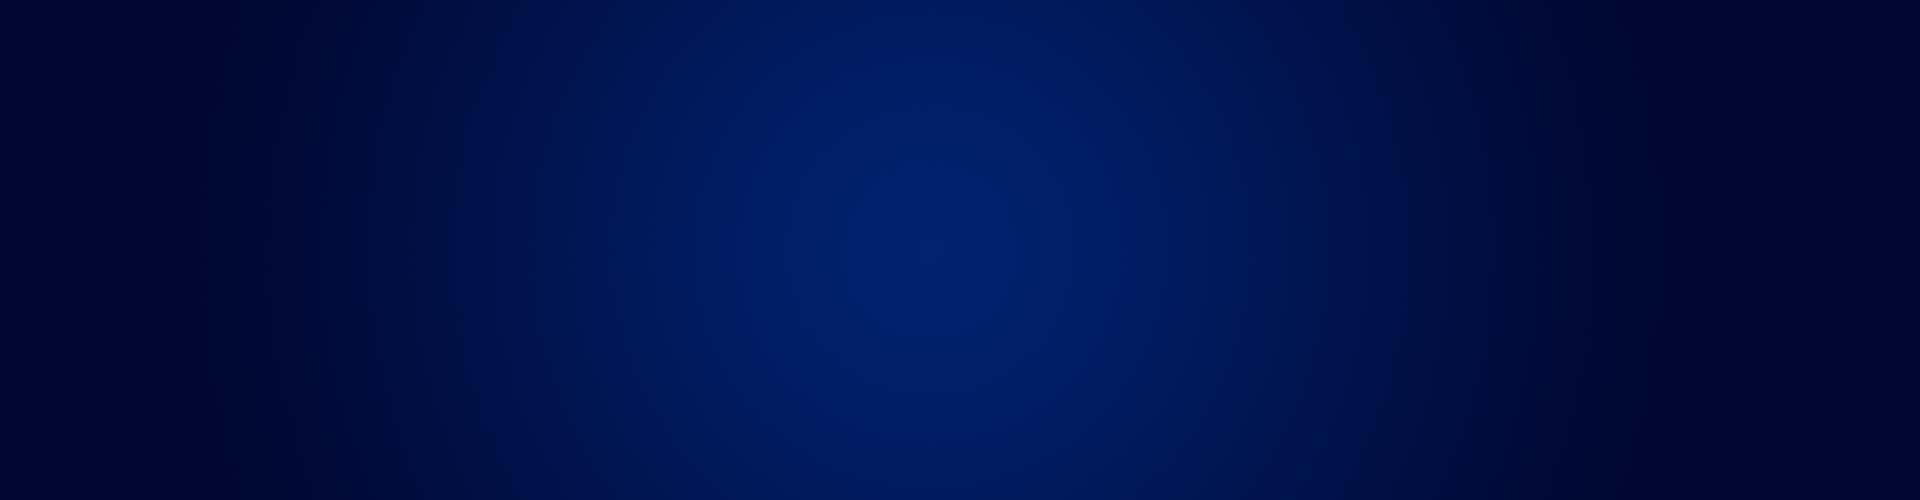 blue-bg-dvd